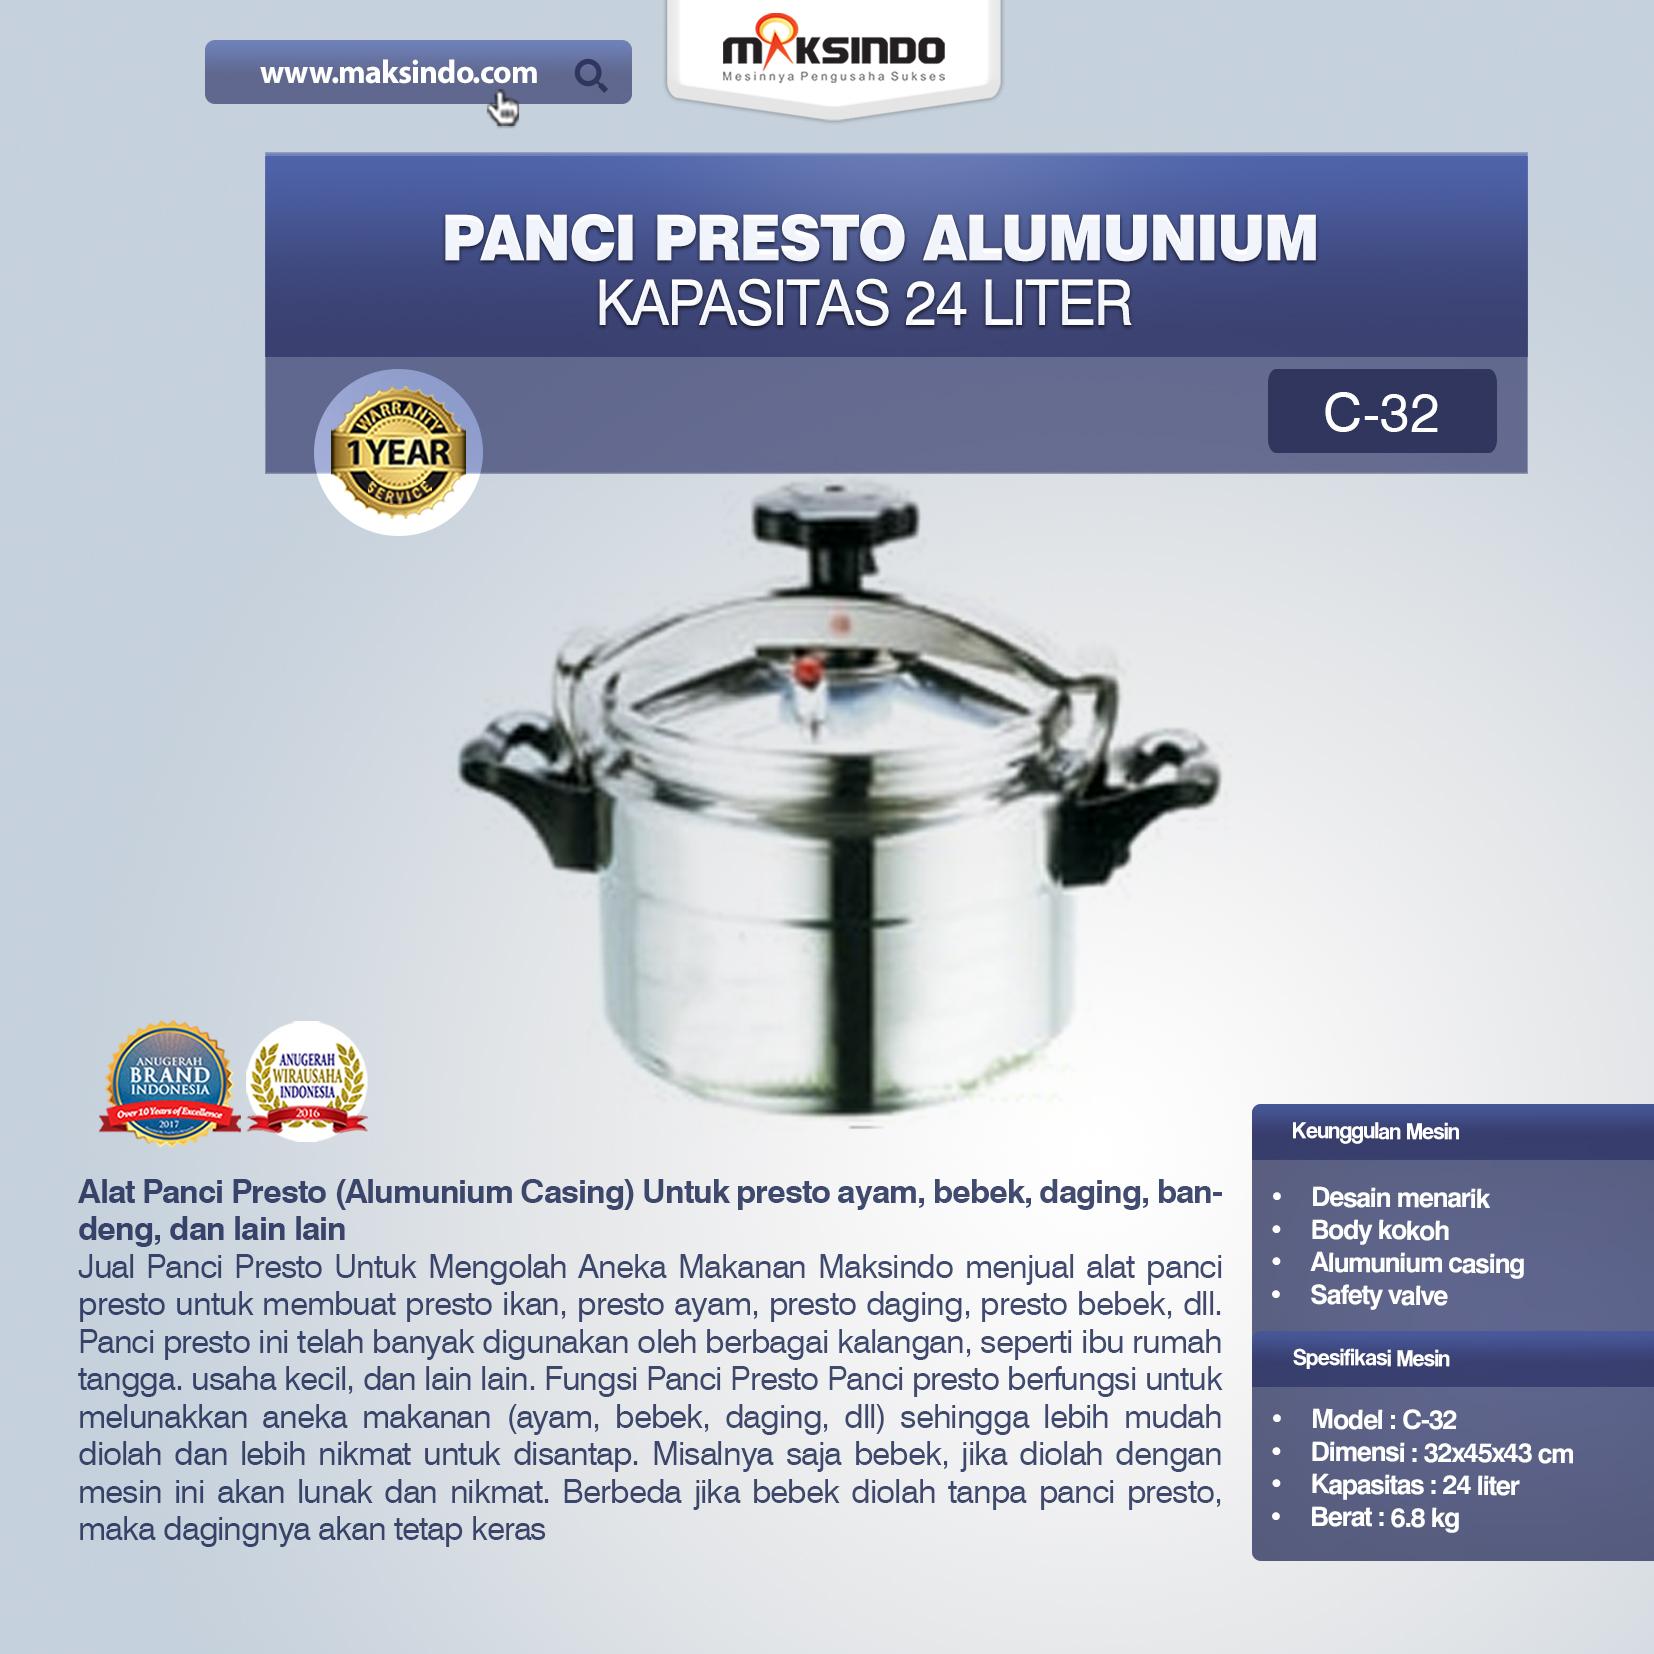 Jual Panci Presto Alumunium 7 -135 Liter di Malang